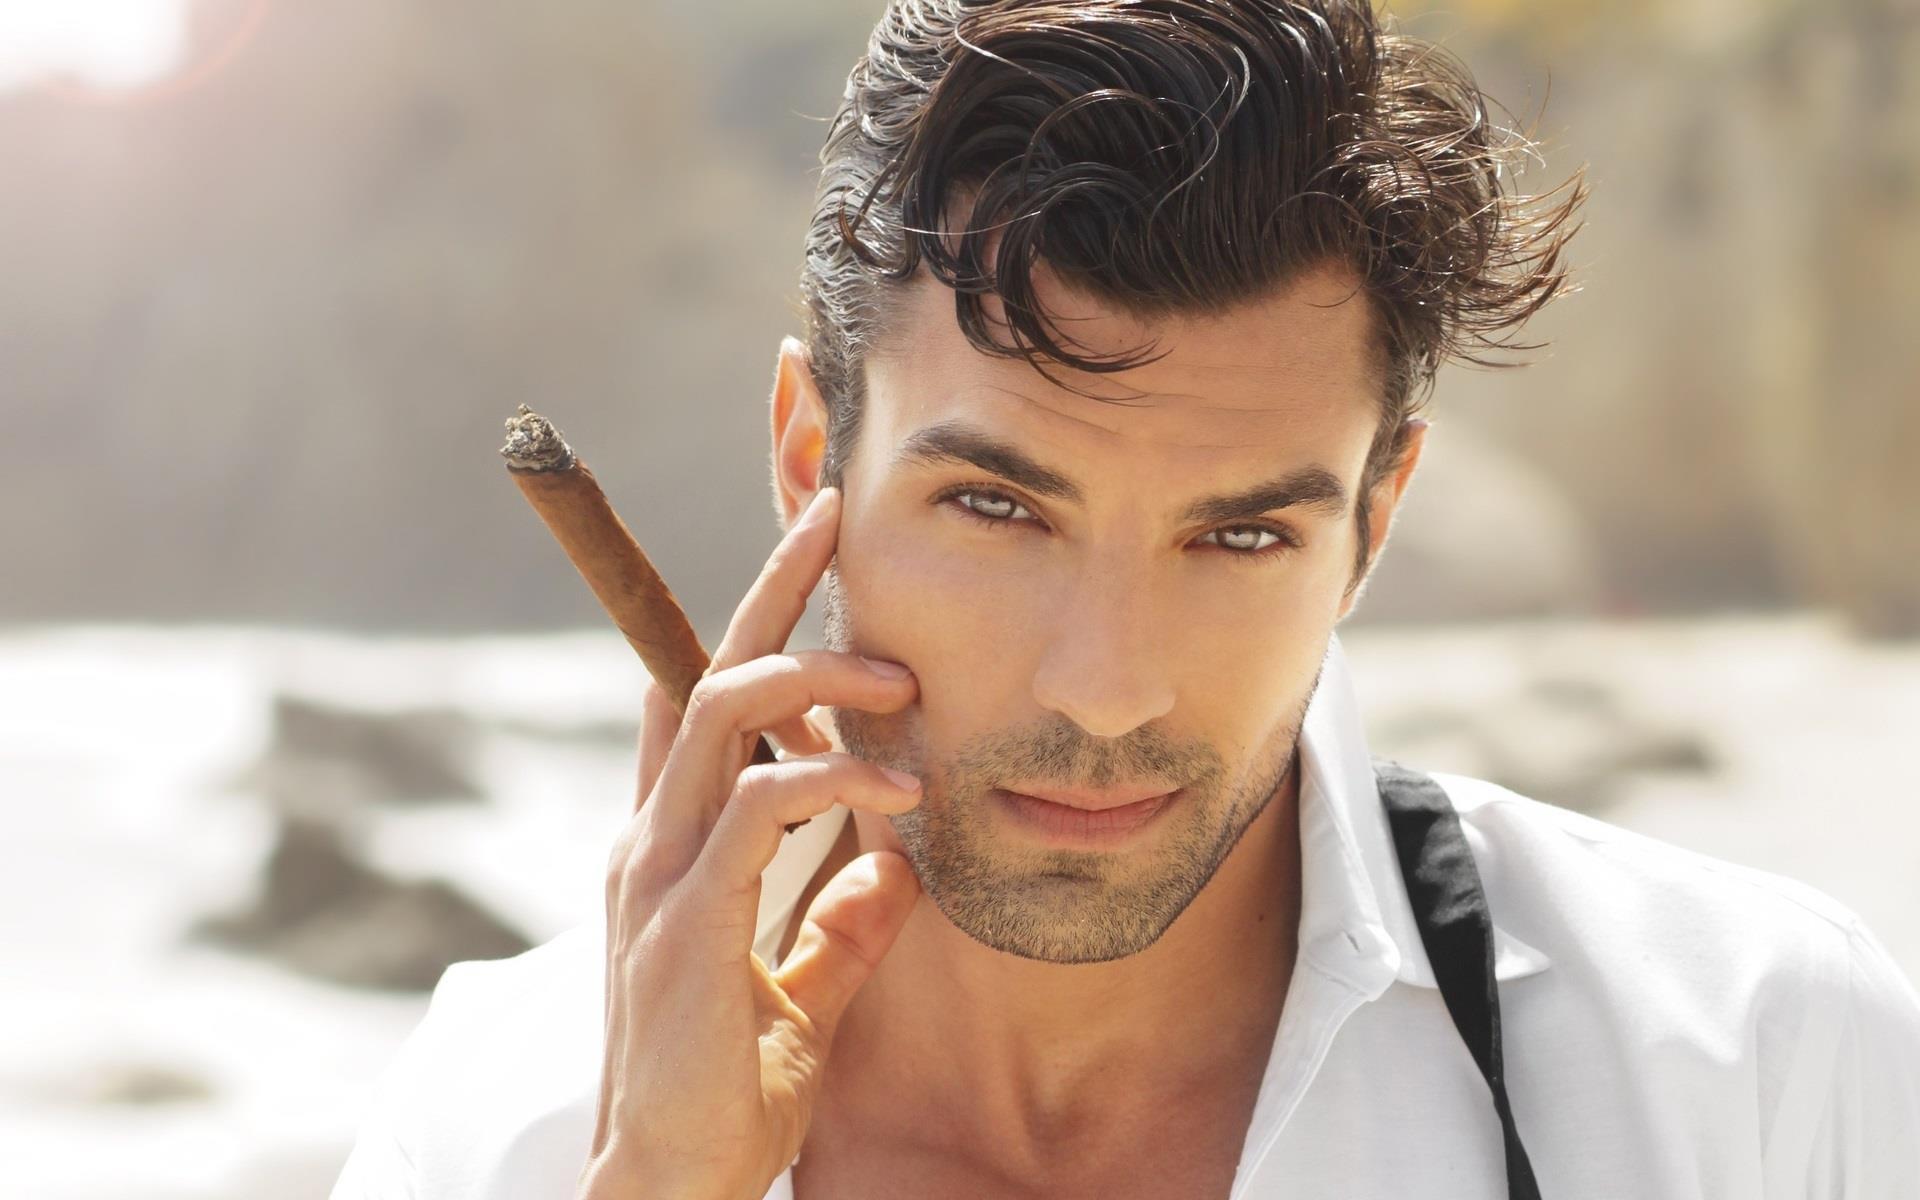 telecharger-fond-ecran_top-modele-homme-sexy_5